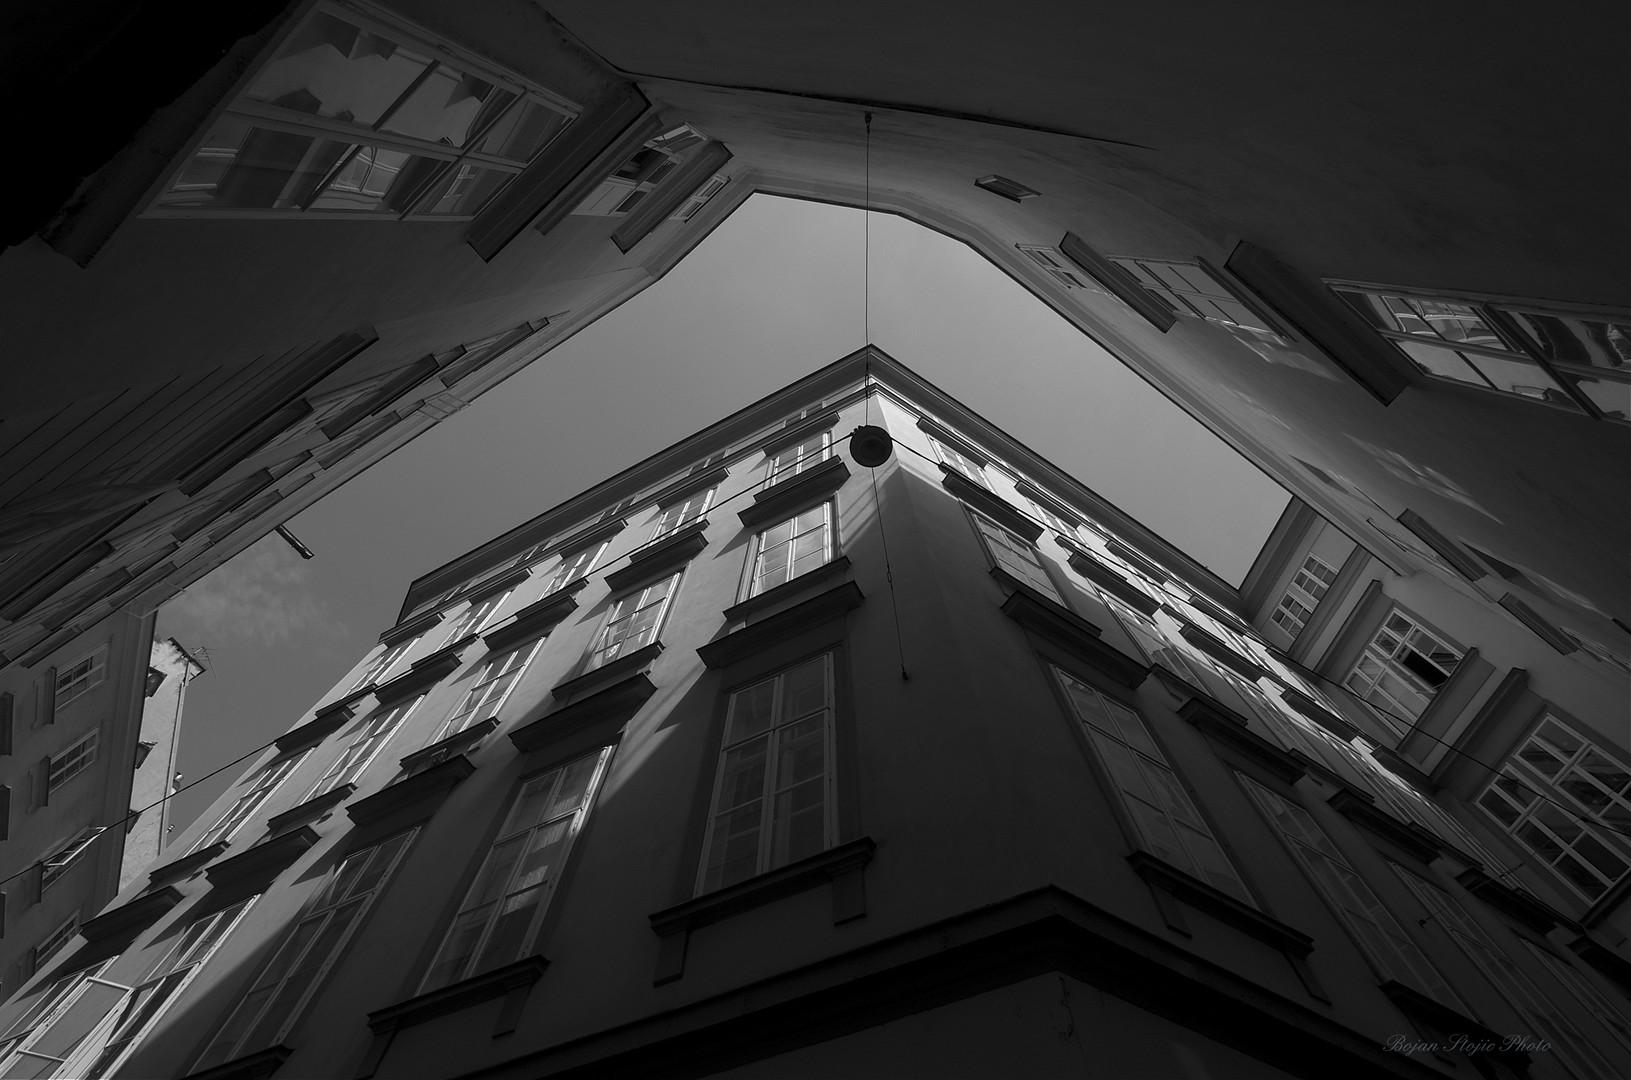 Visoka ulica